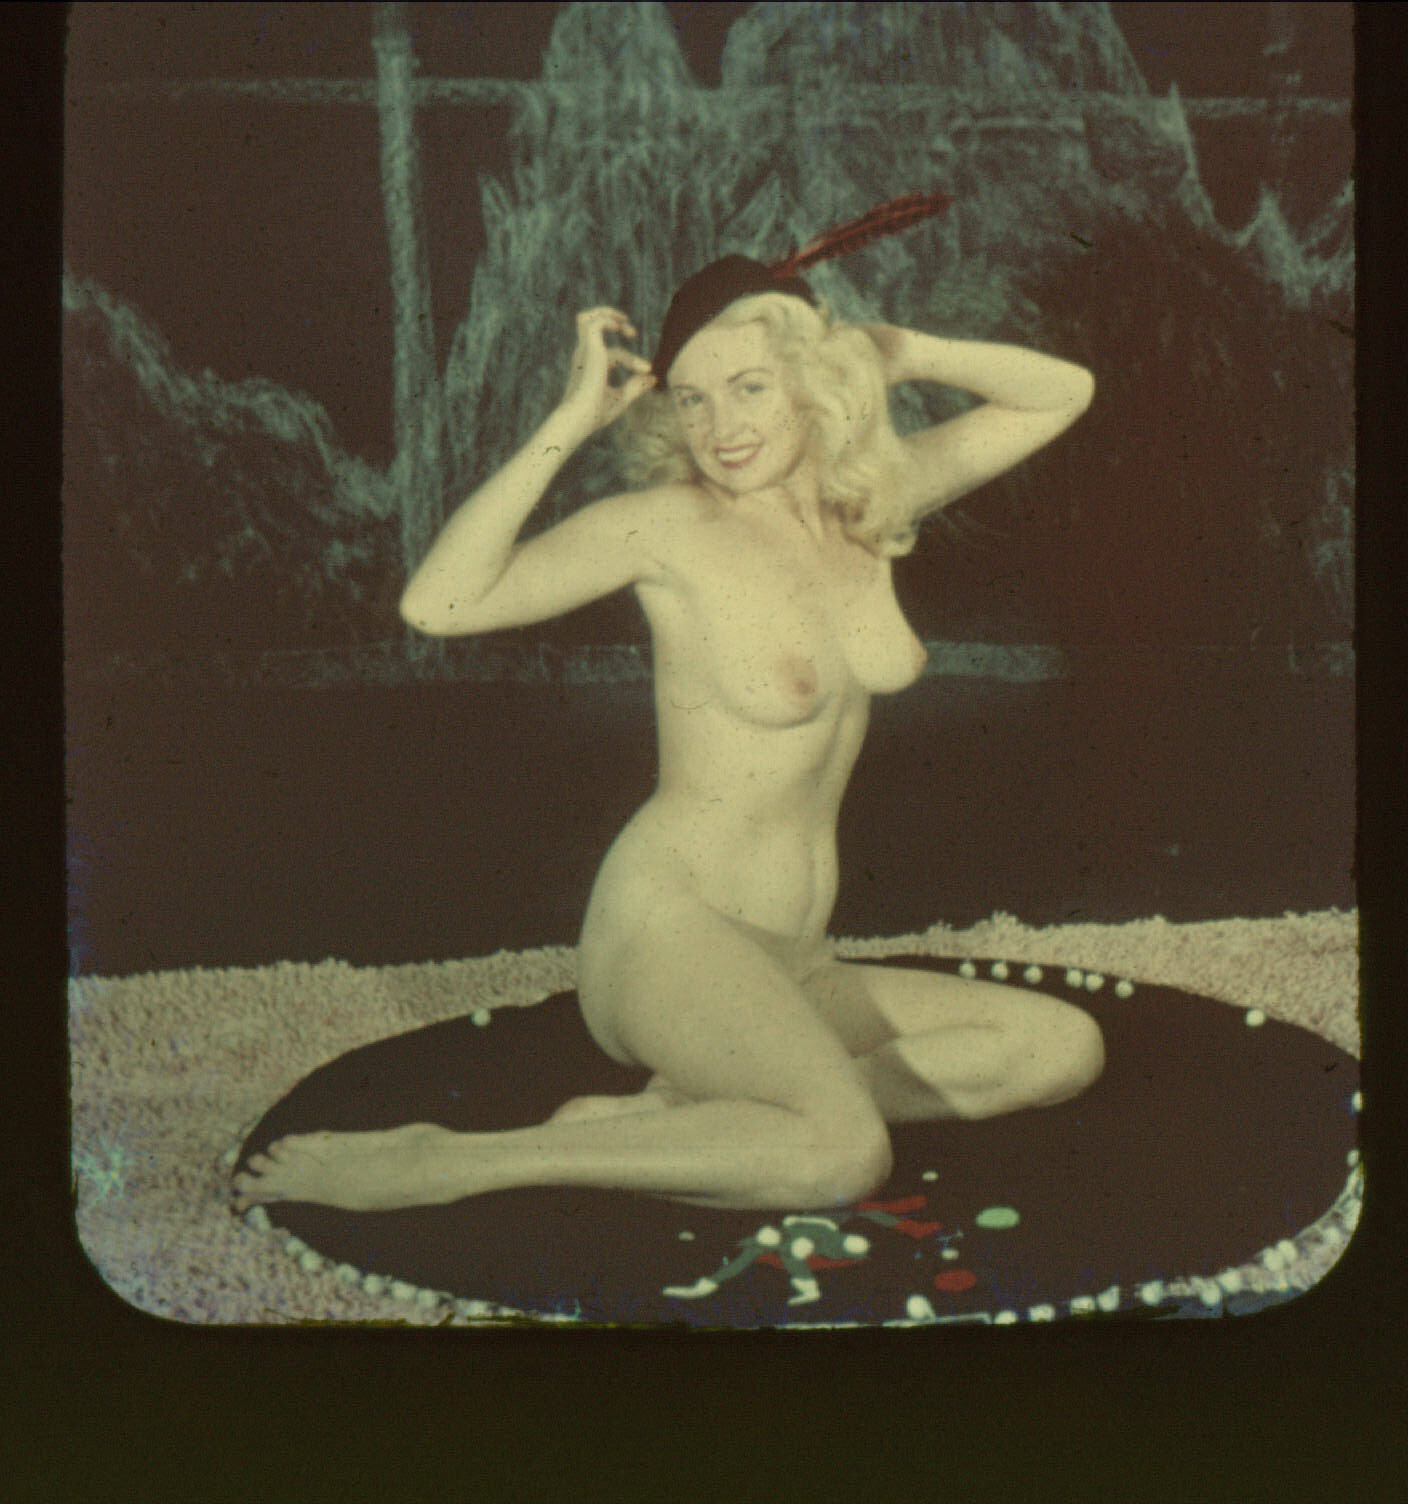 1940s Color Porn - Circa 1940s? VERY GOOD only